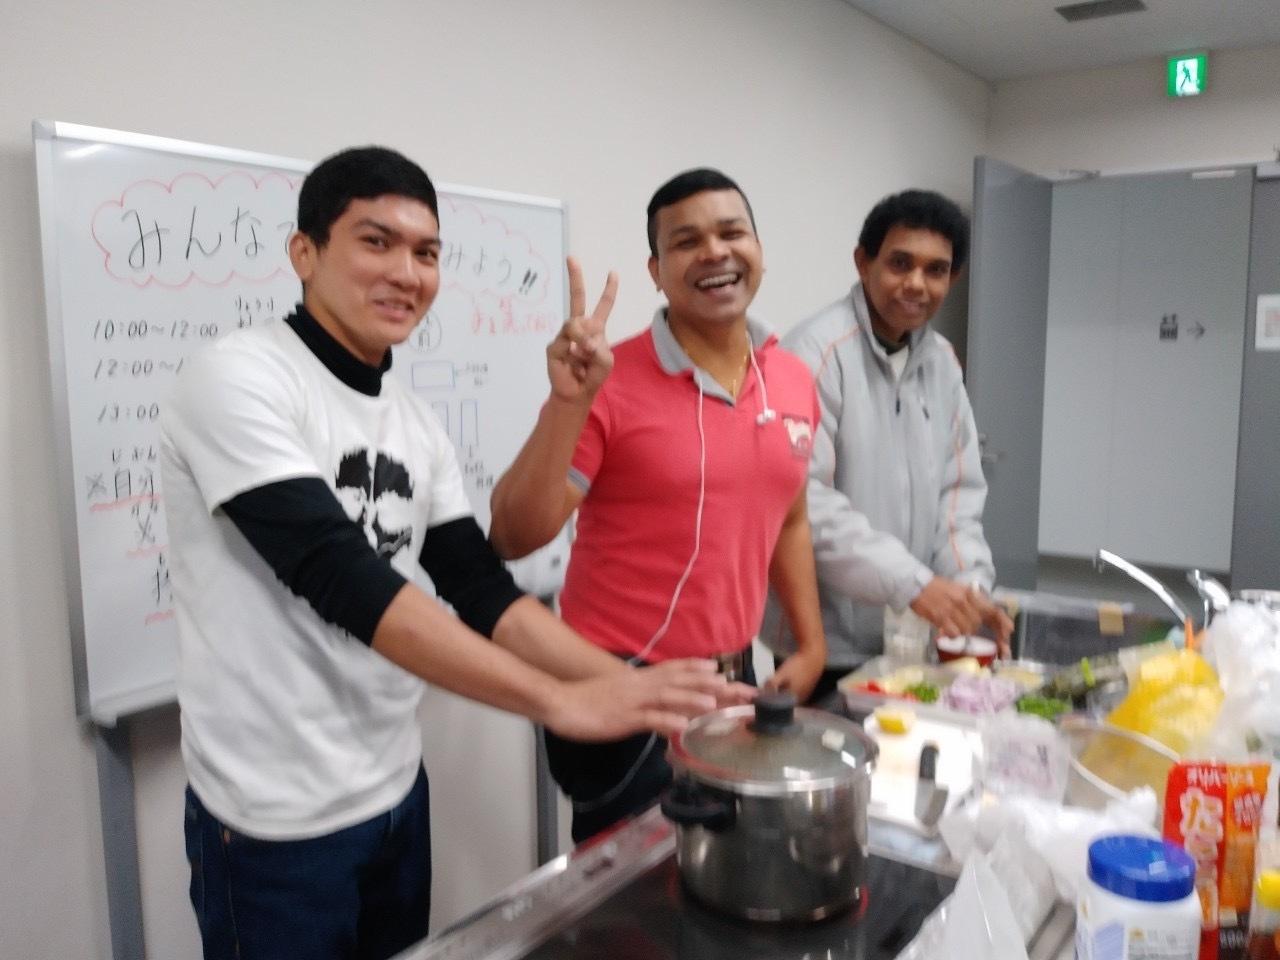 私の国の料理ー火曜夜教室_e0175020_15502657.jpg